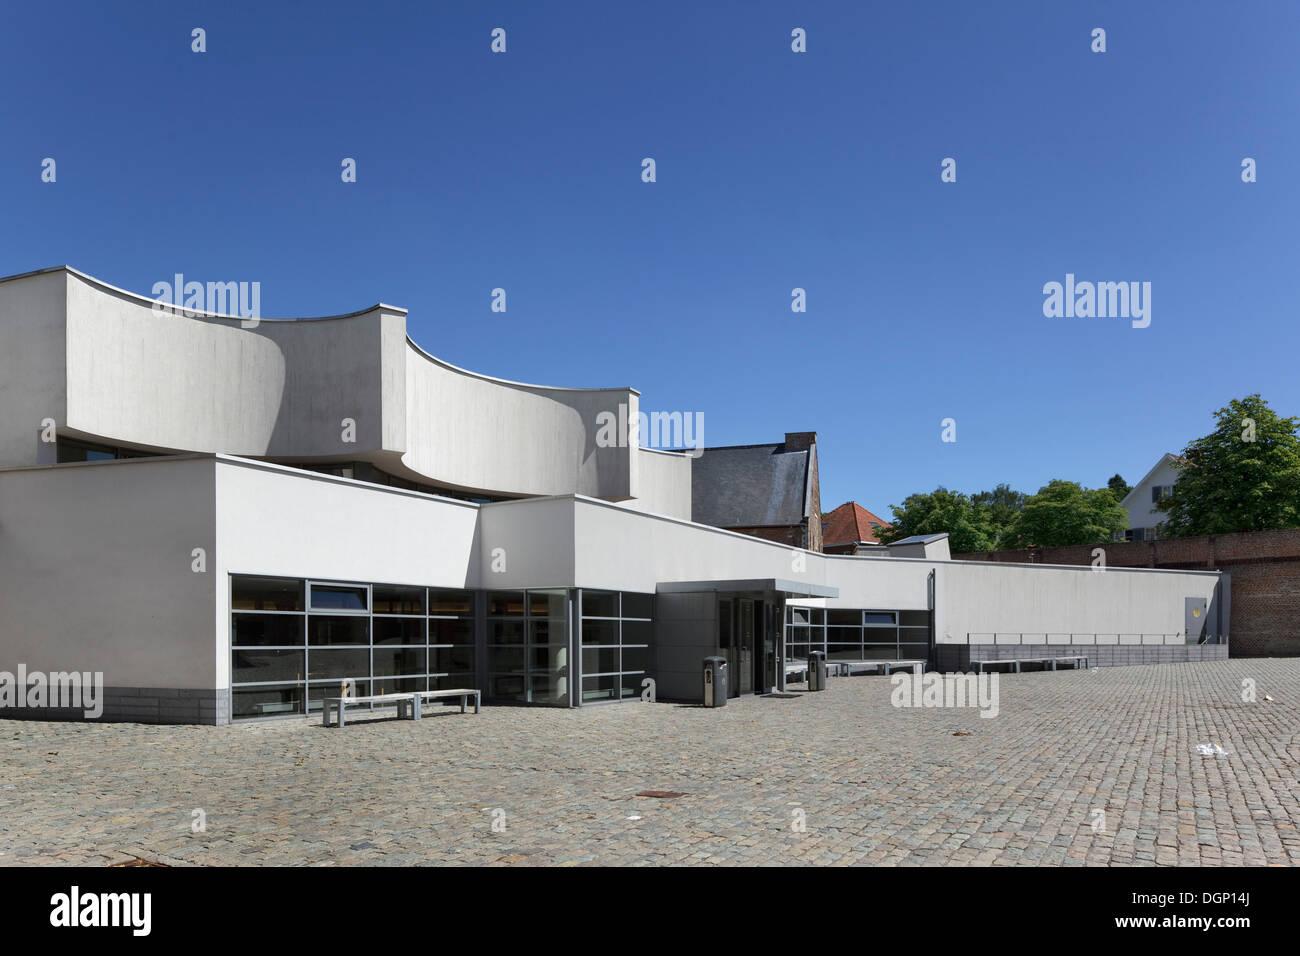 Catholic University of Leuven Arenberg Library, Leuven, Belgium. Architect: Rafael Moneo, 2002. Main entrance to Library, with w - Stock Image